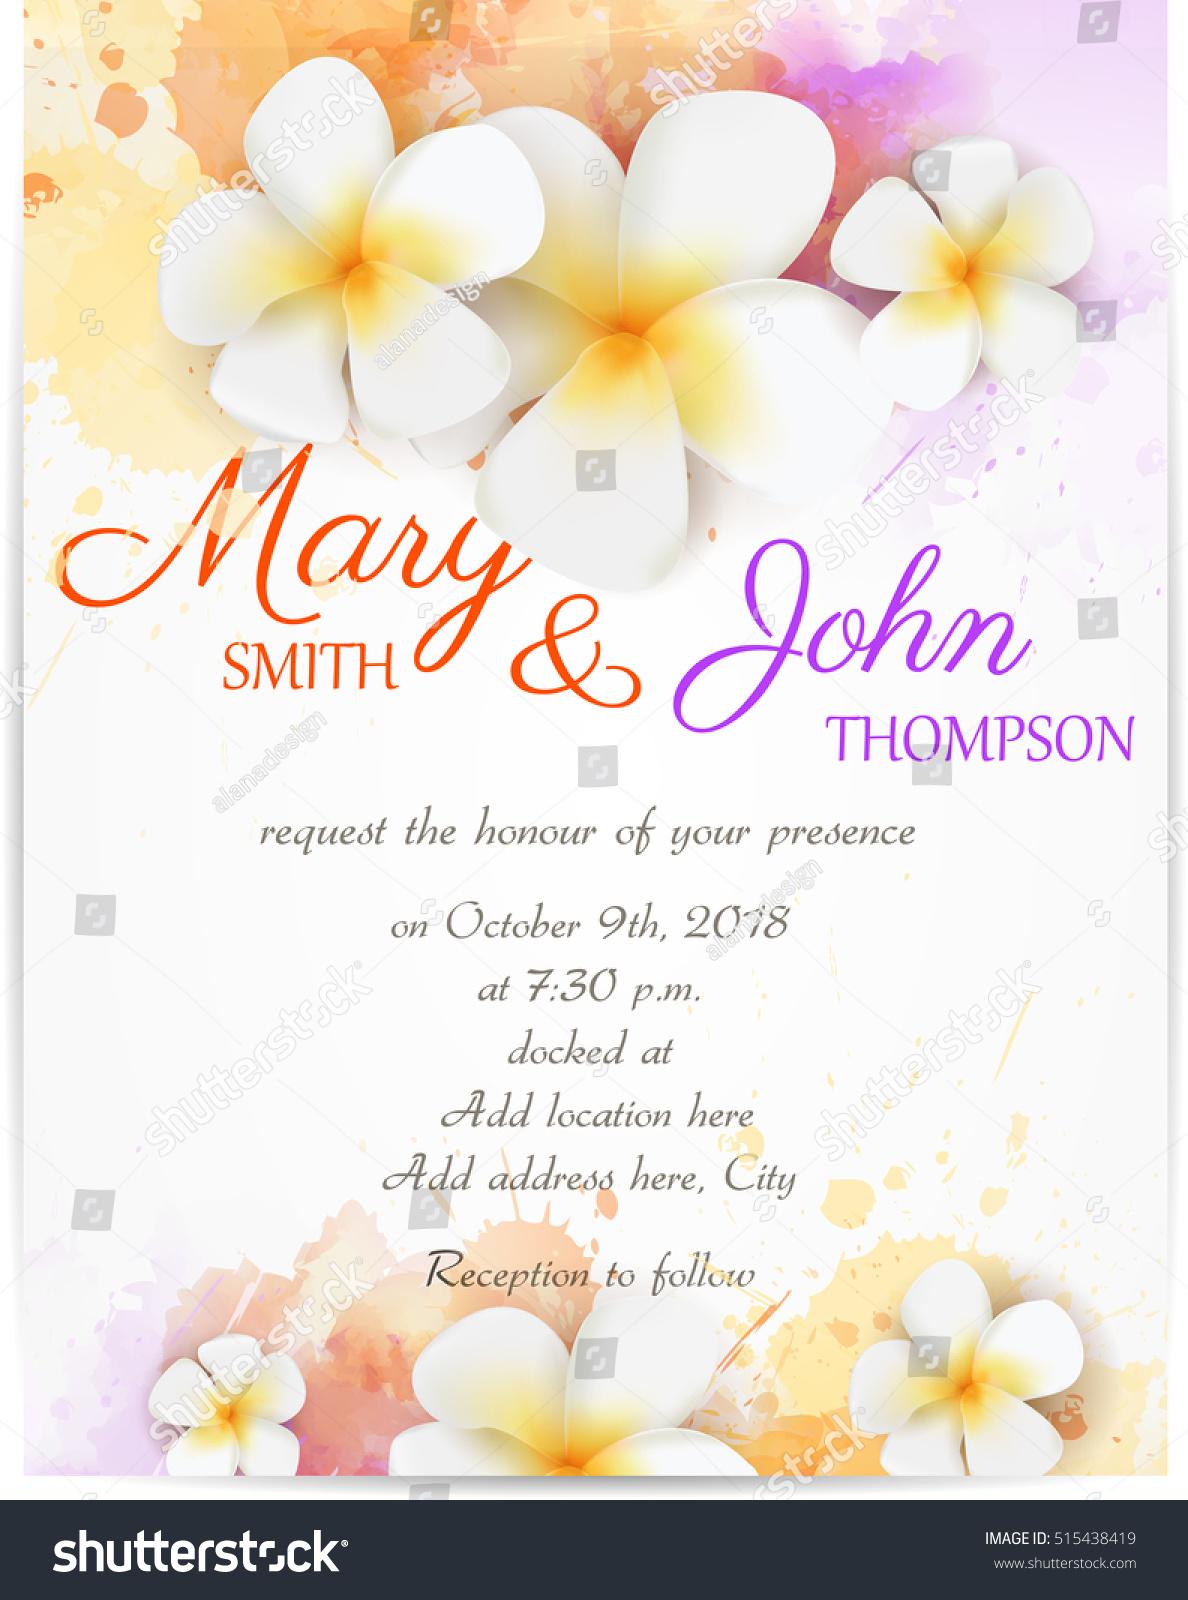 Wedding Invitation Template Plumeria Flowers On Stock Vector ...